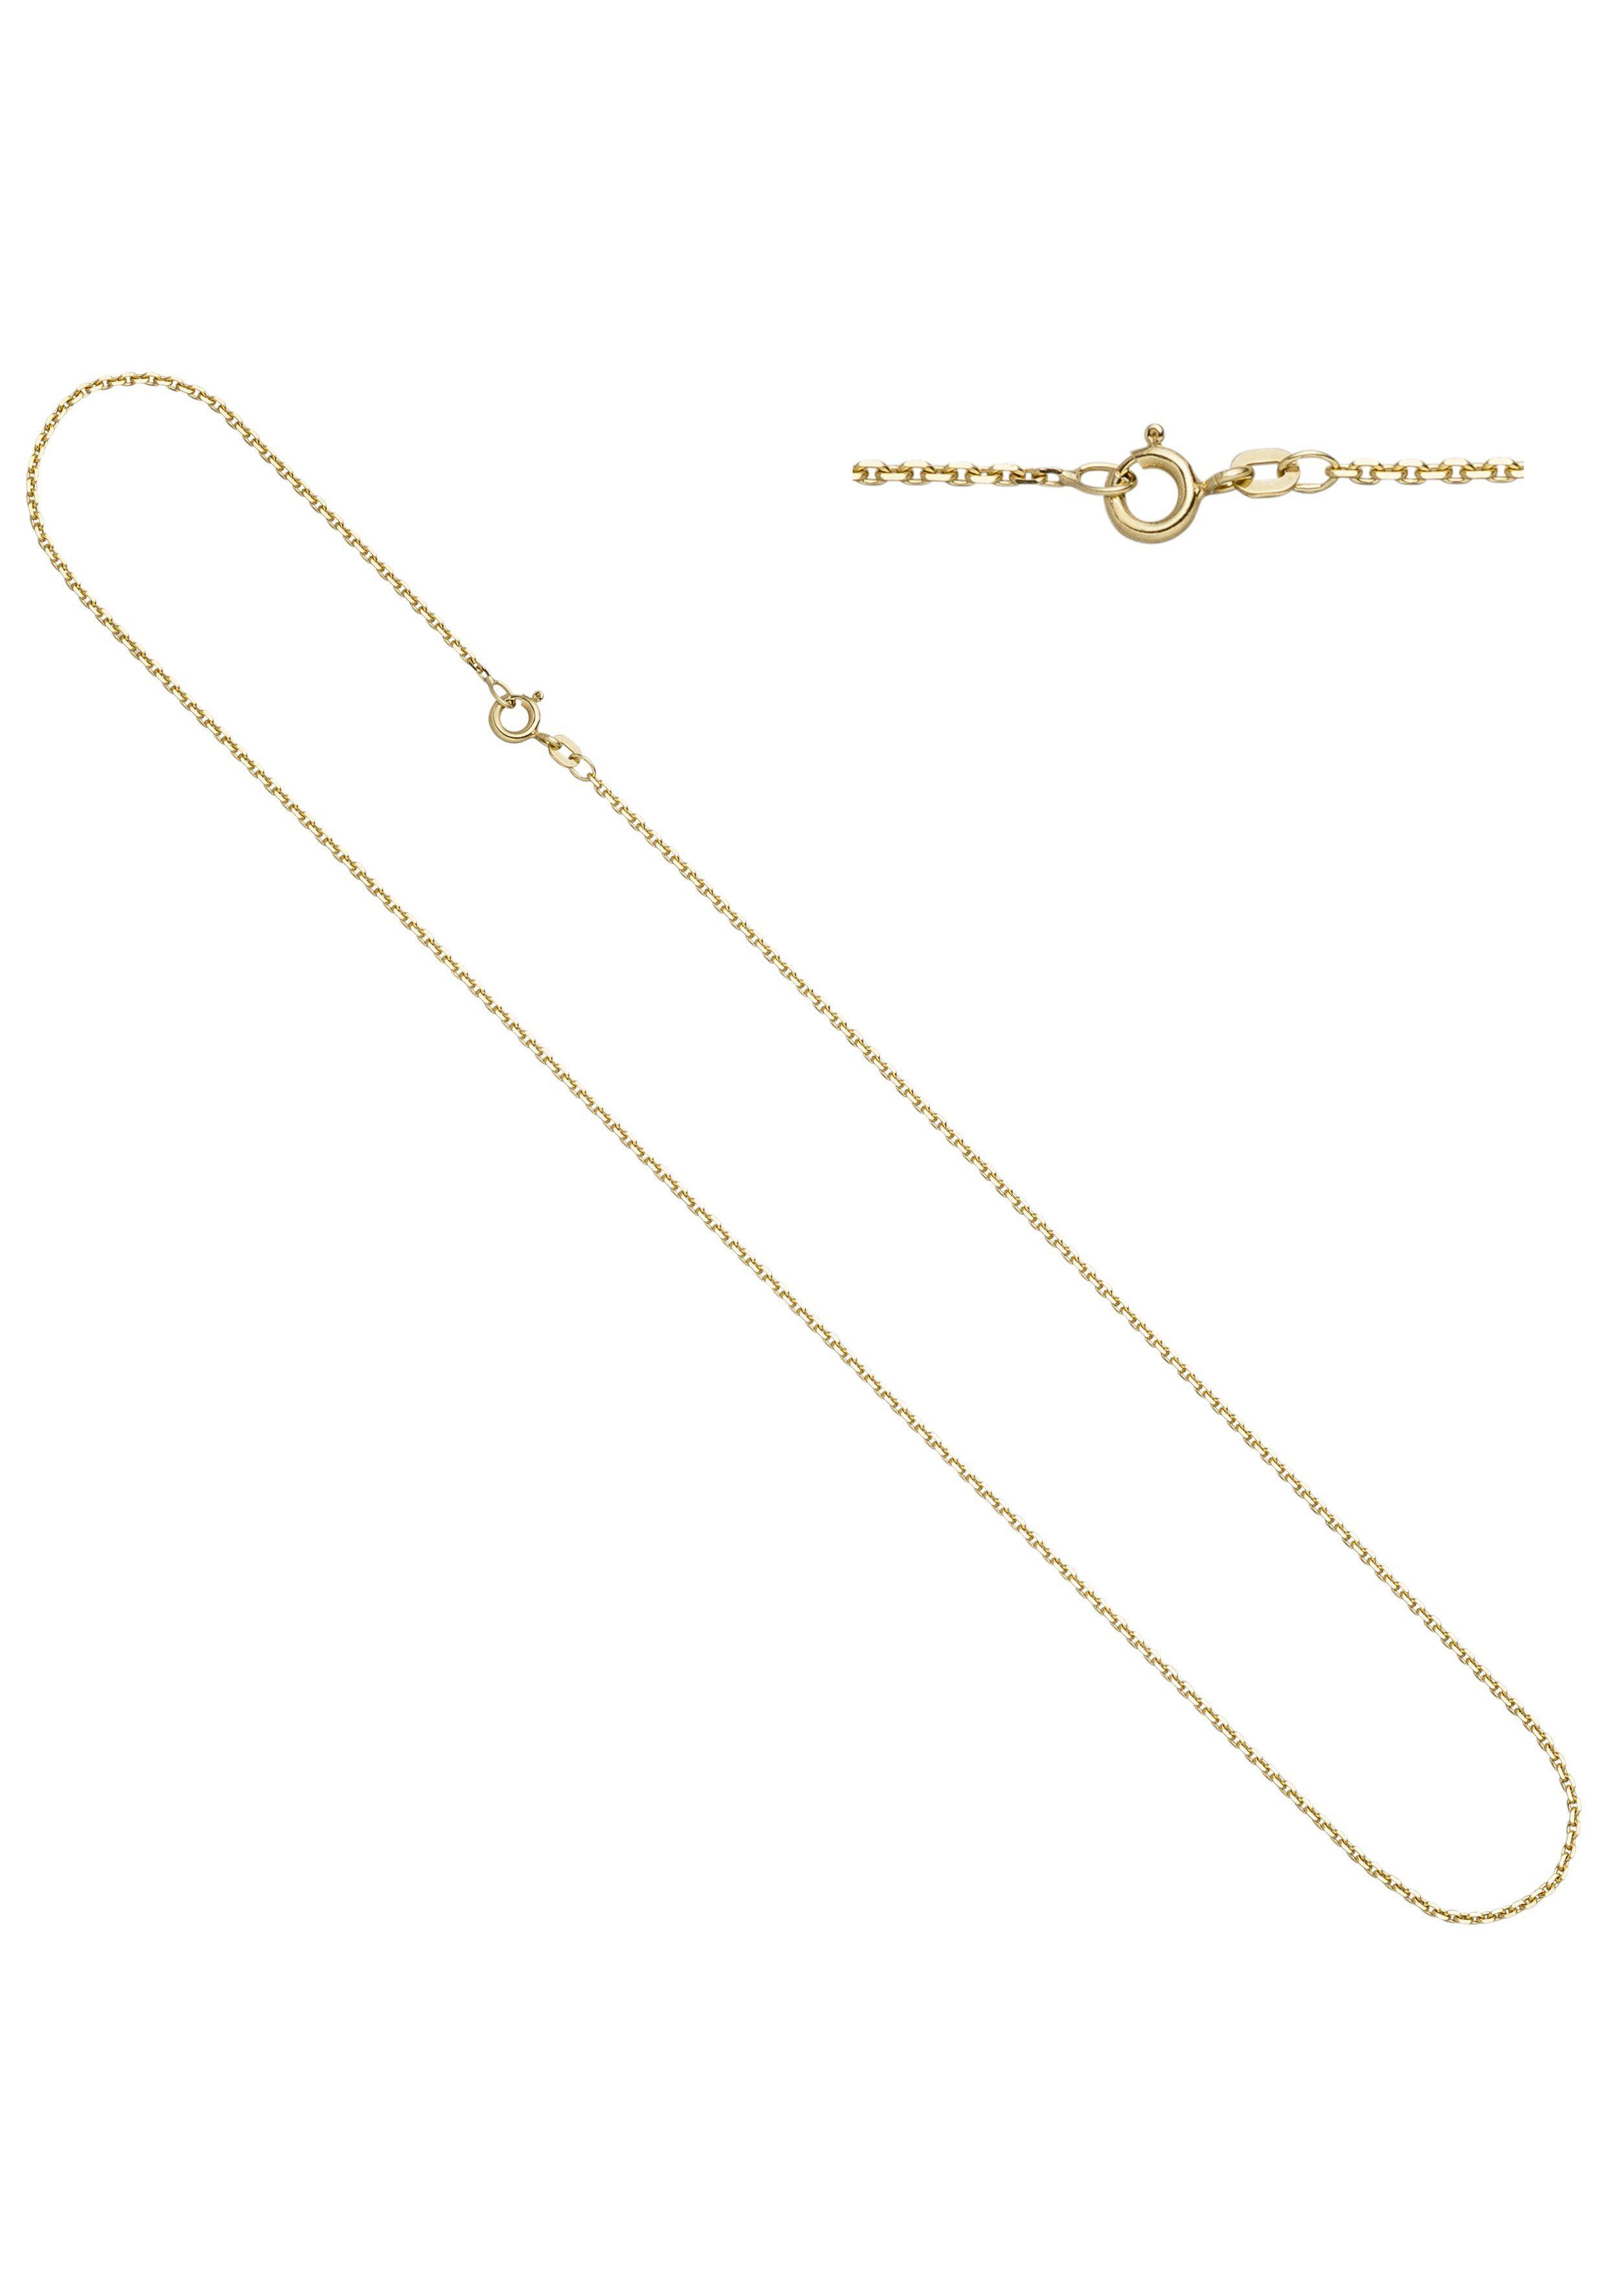 JOBO Goldkette Ankerkette 585 Gold diamantiert 50 cm 1,6 mm